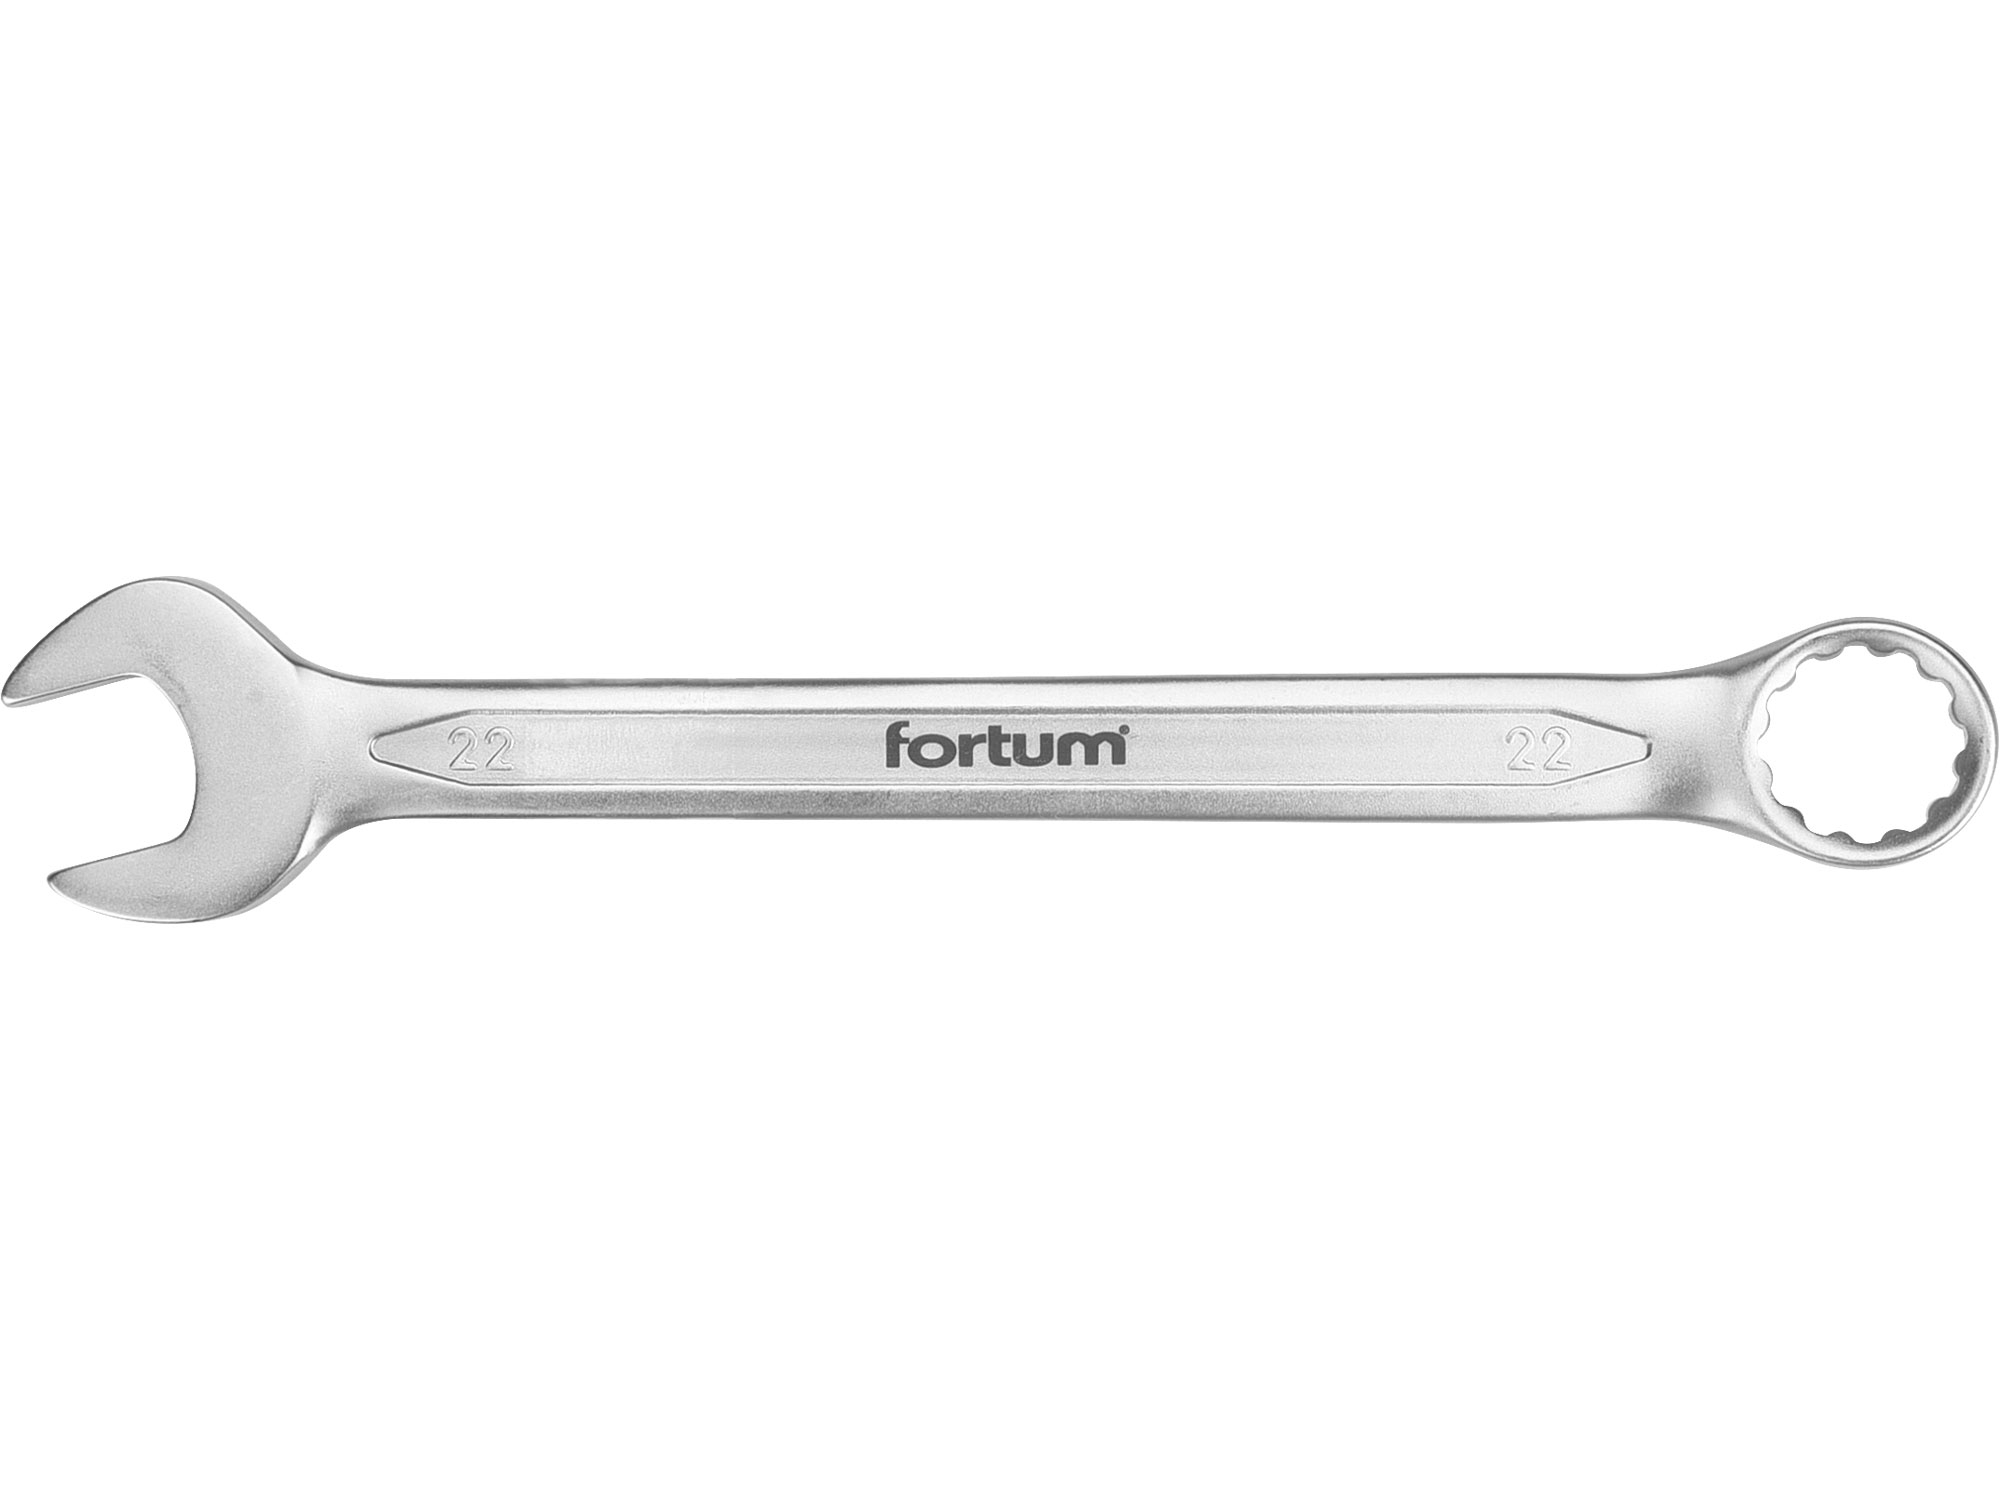 klíč očkoplochý, 22mm, L 272mm, FORTUM 4730222